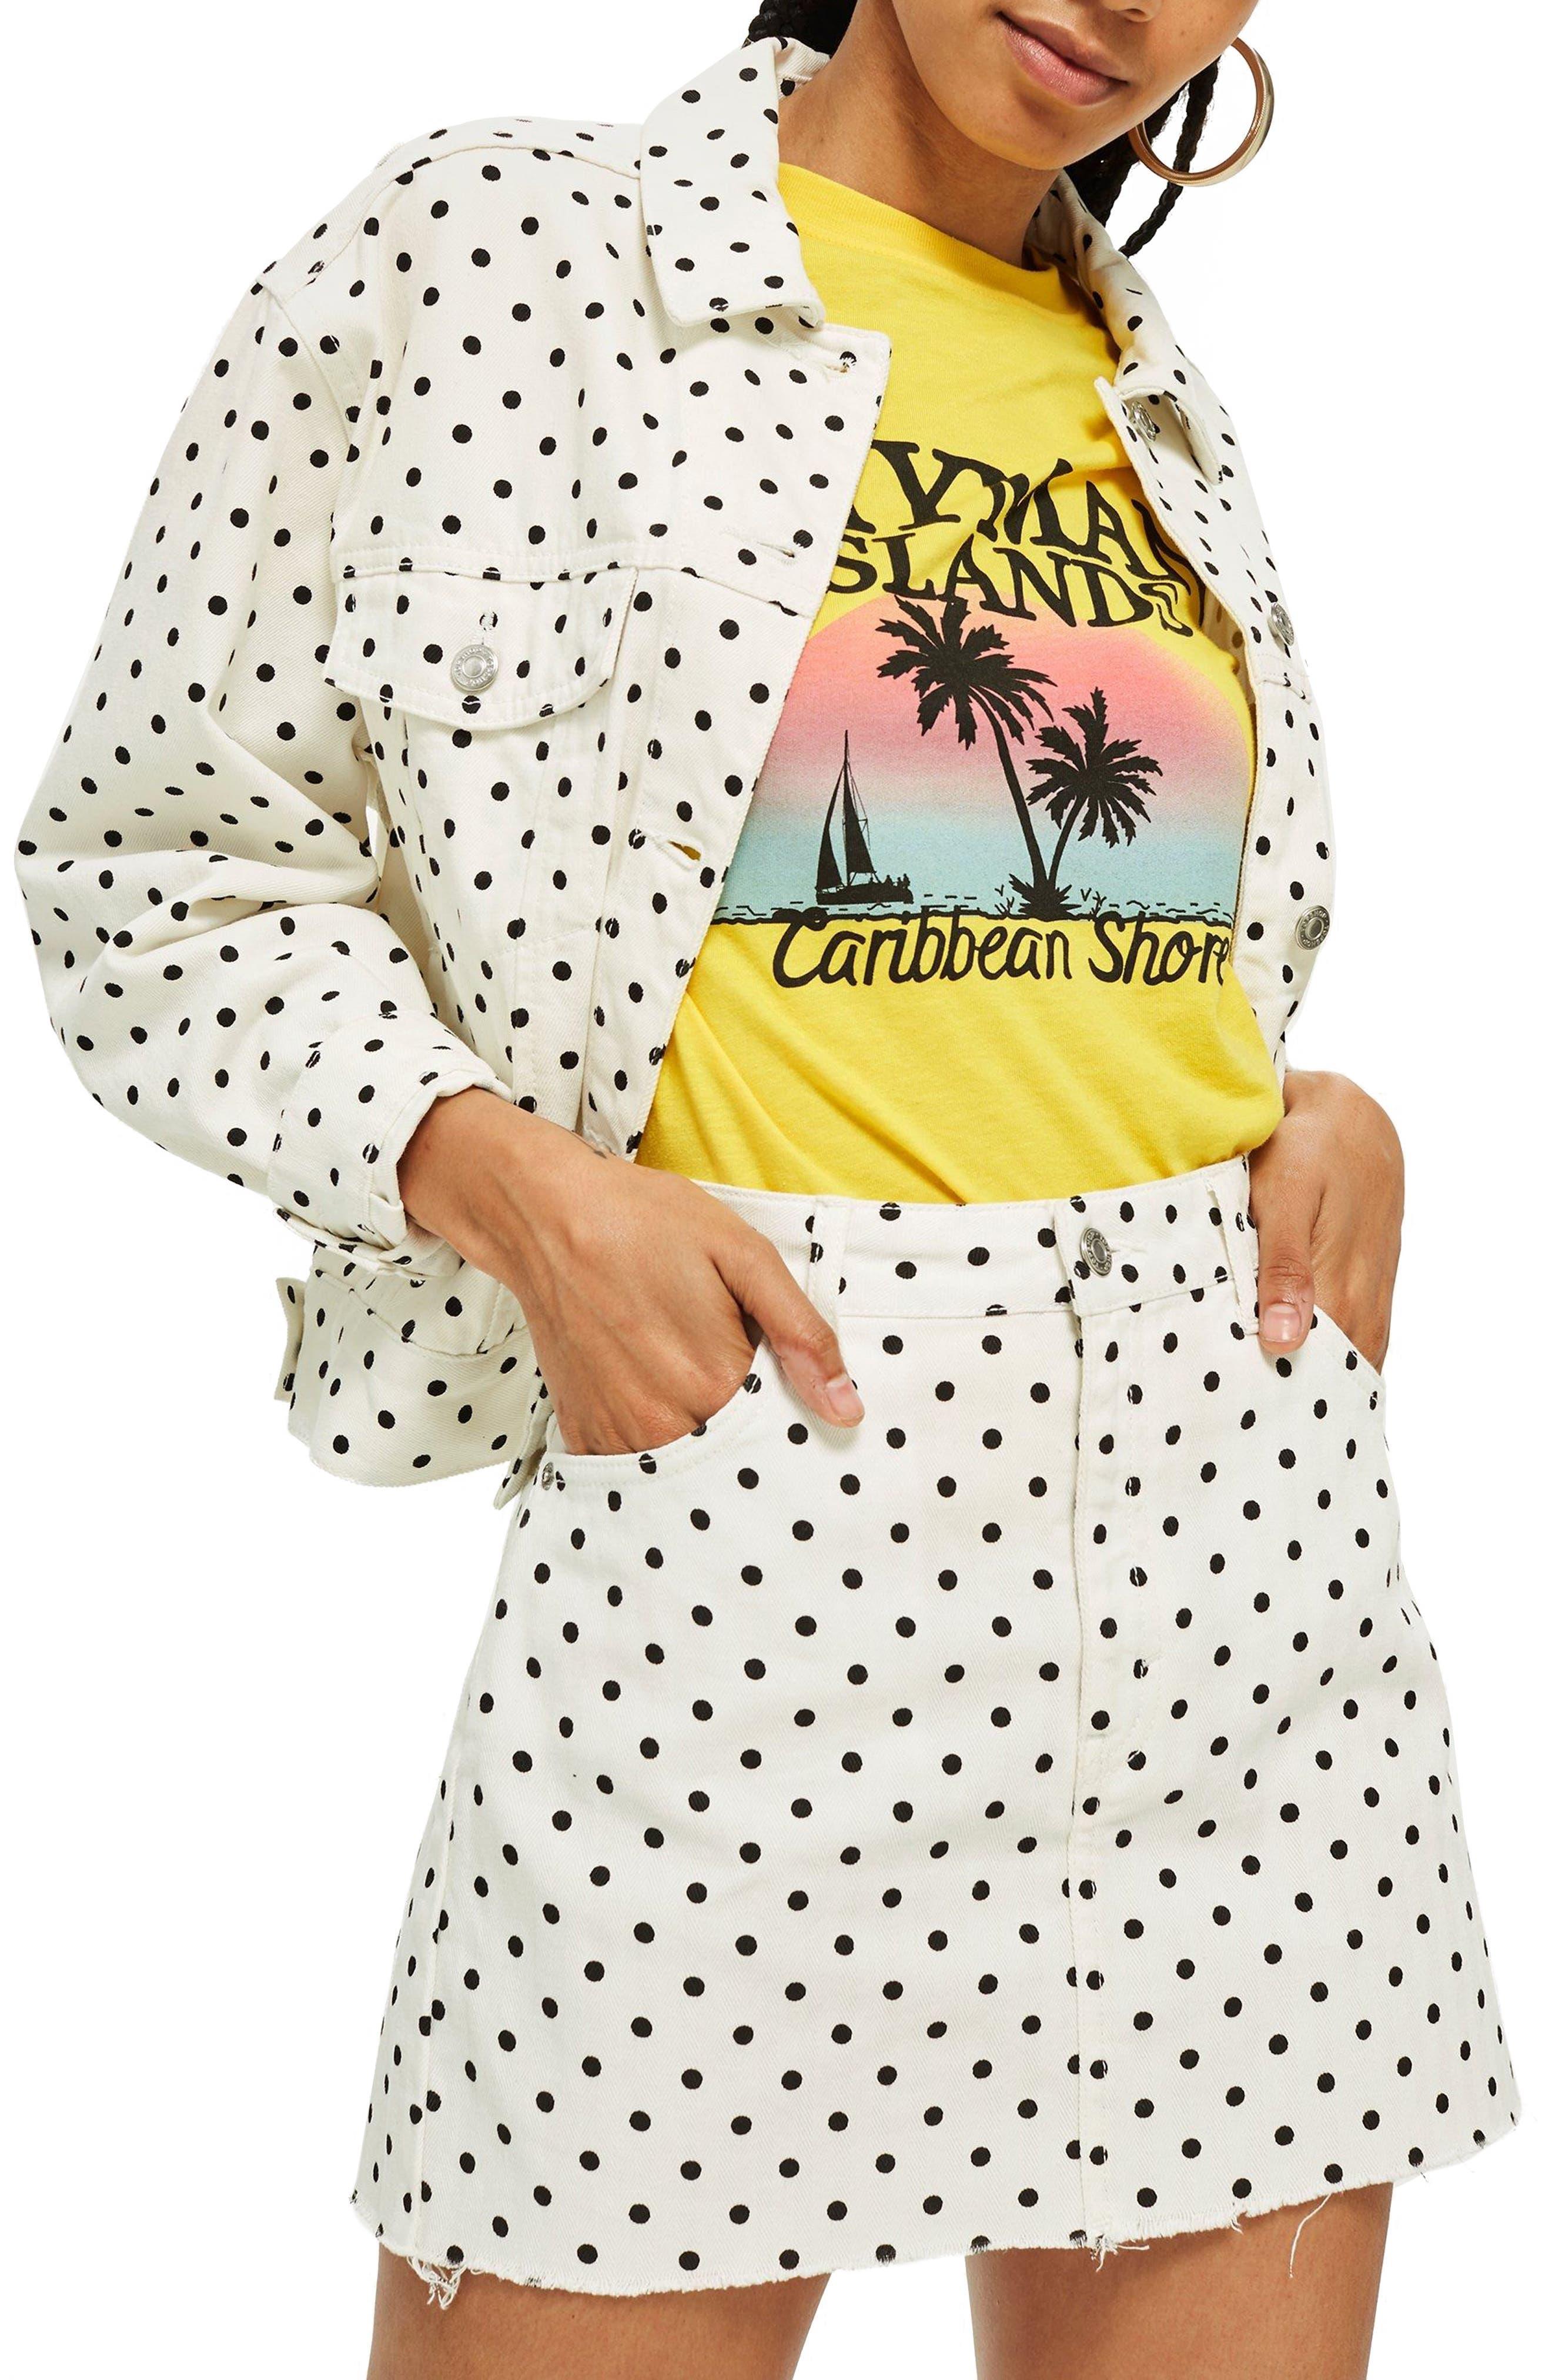 MOTO Polka Dot Crop Nonstretch Denim Jacket,                             Main thumbnail 1, color,                             White Multi